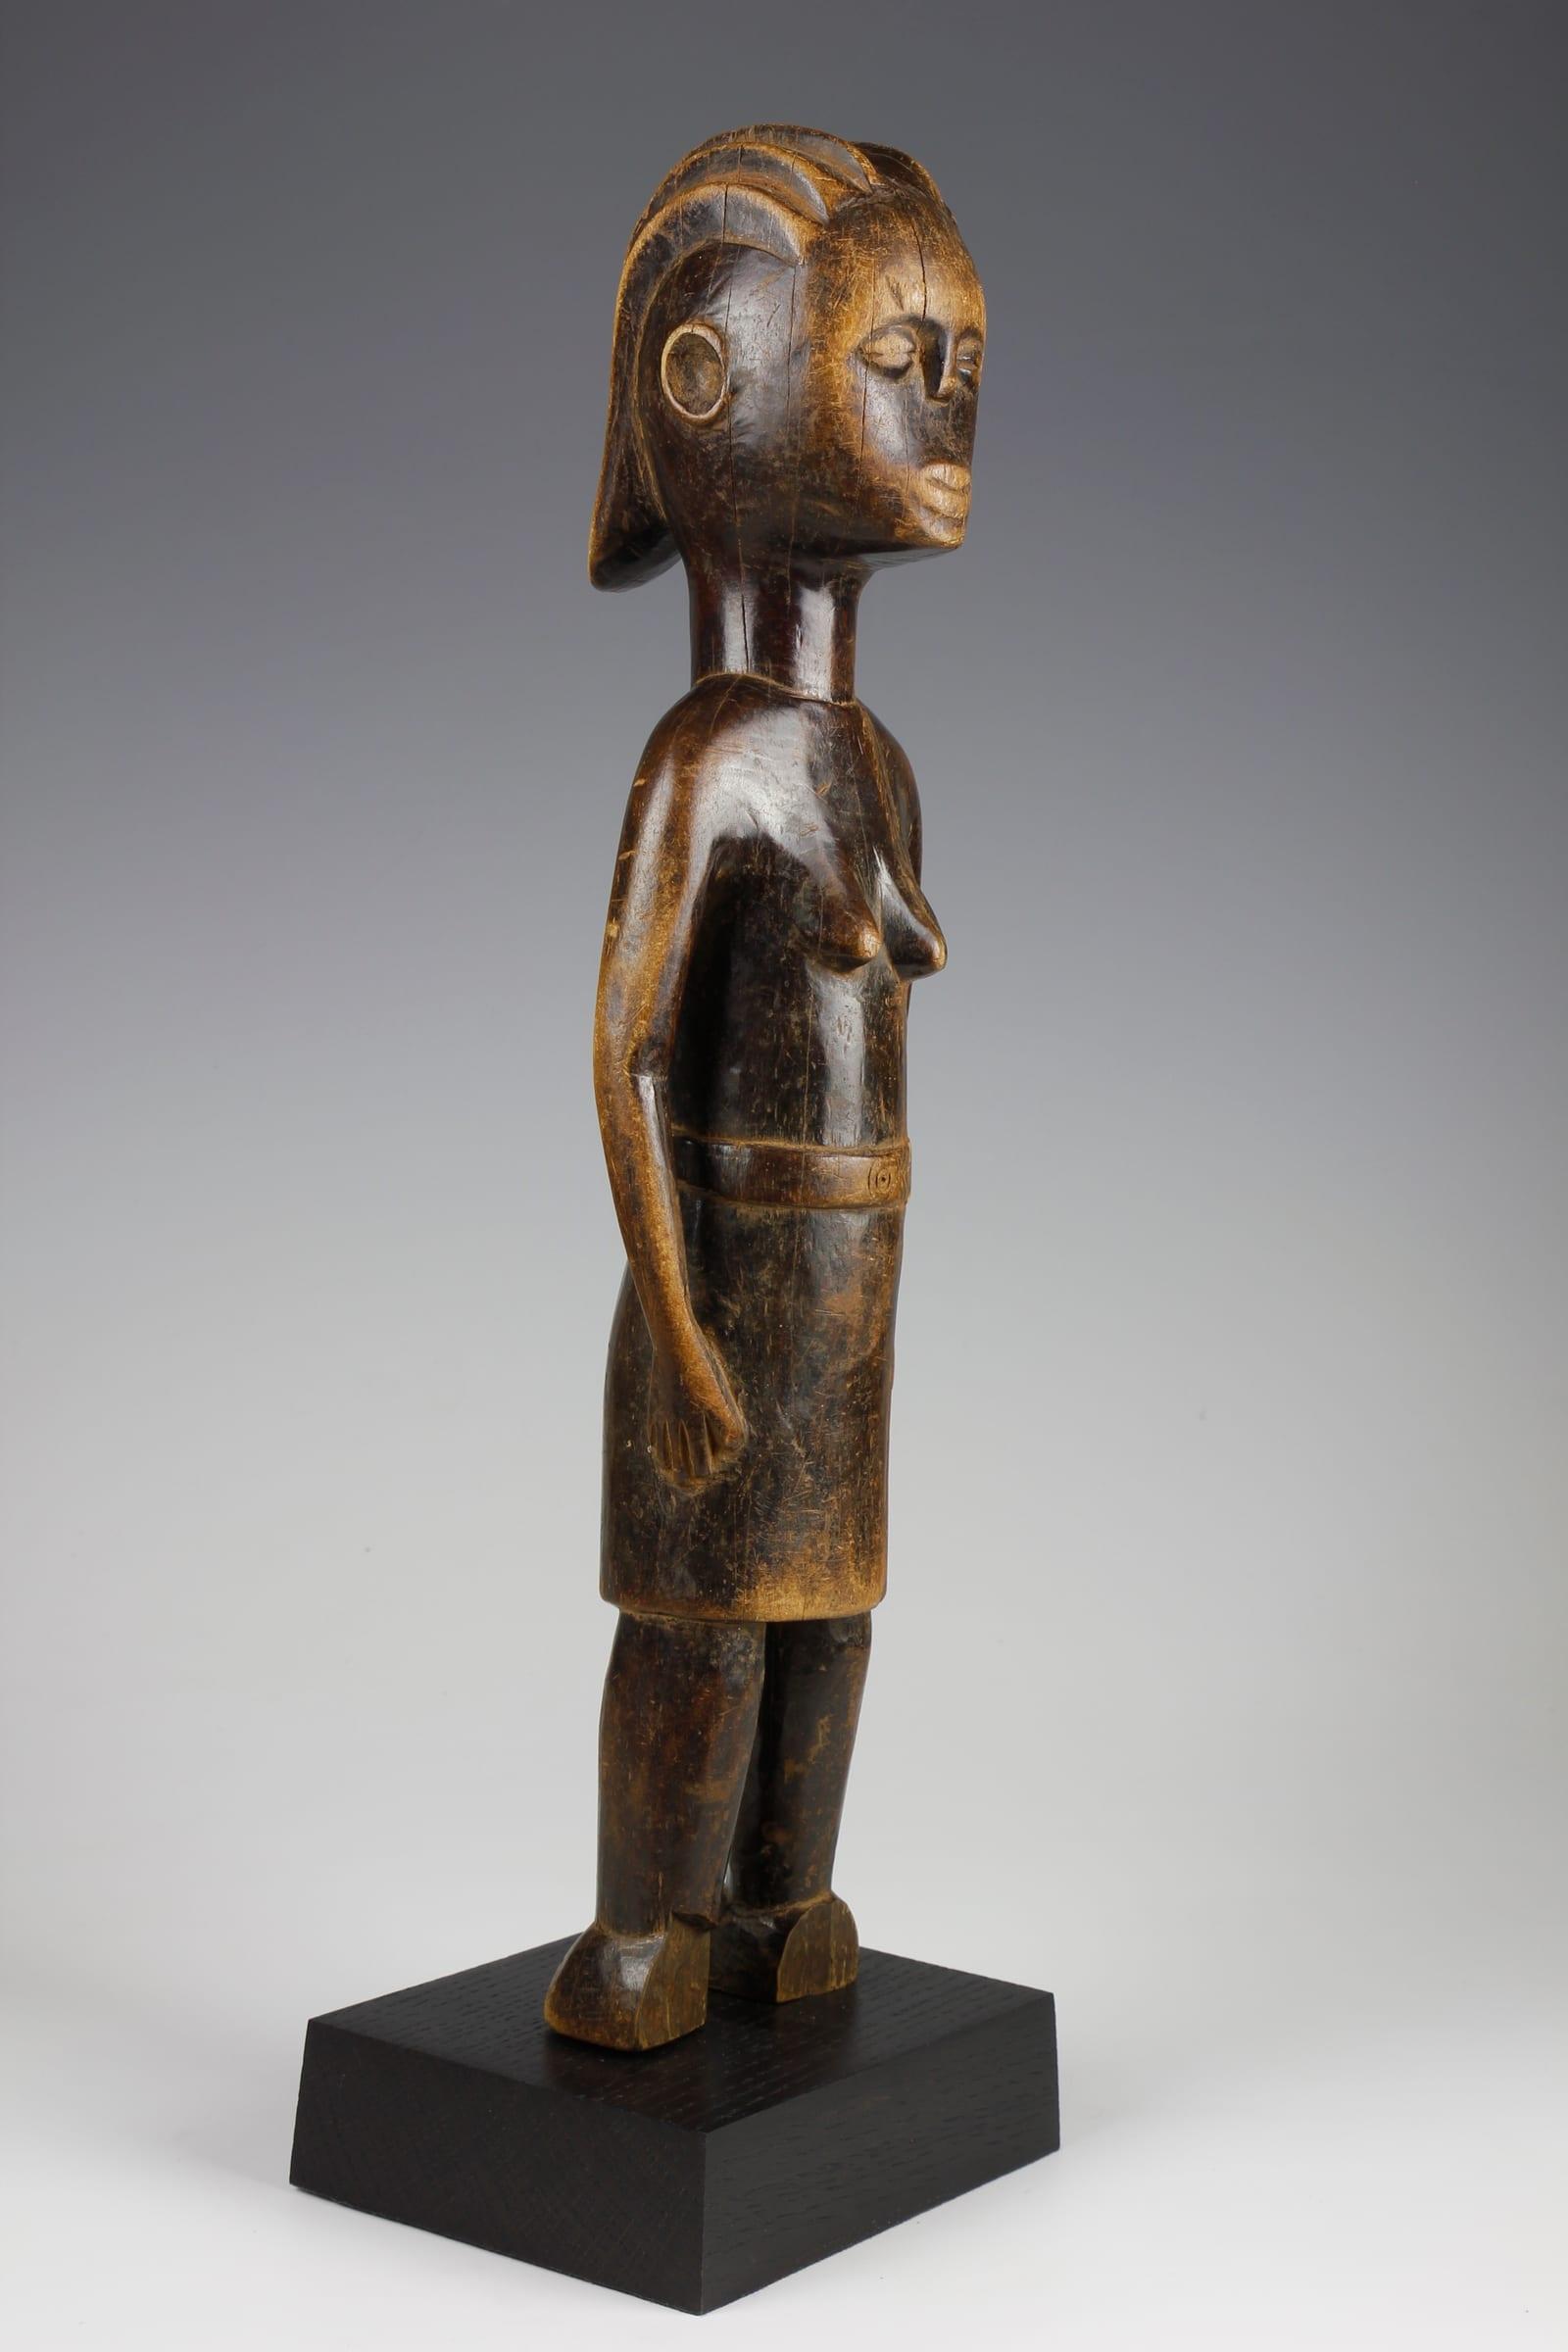 26. Female Figure